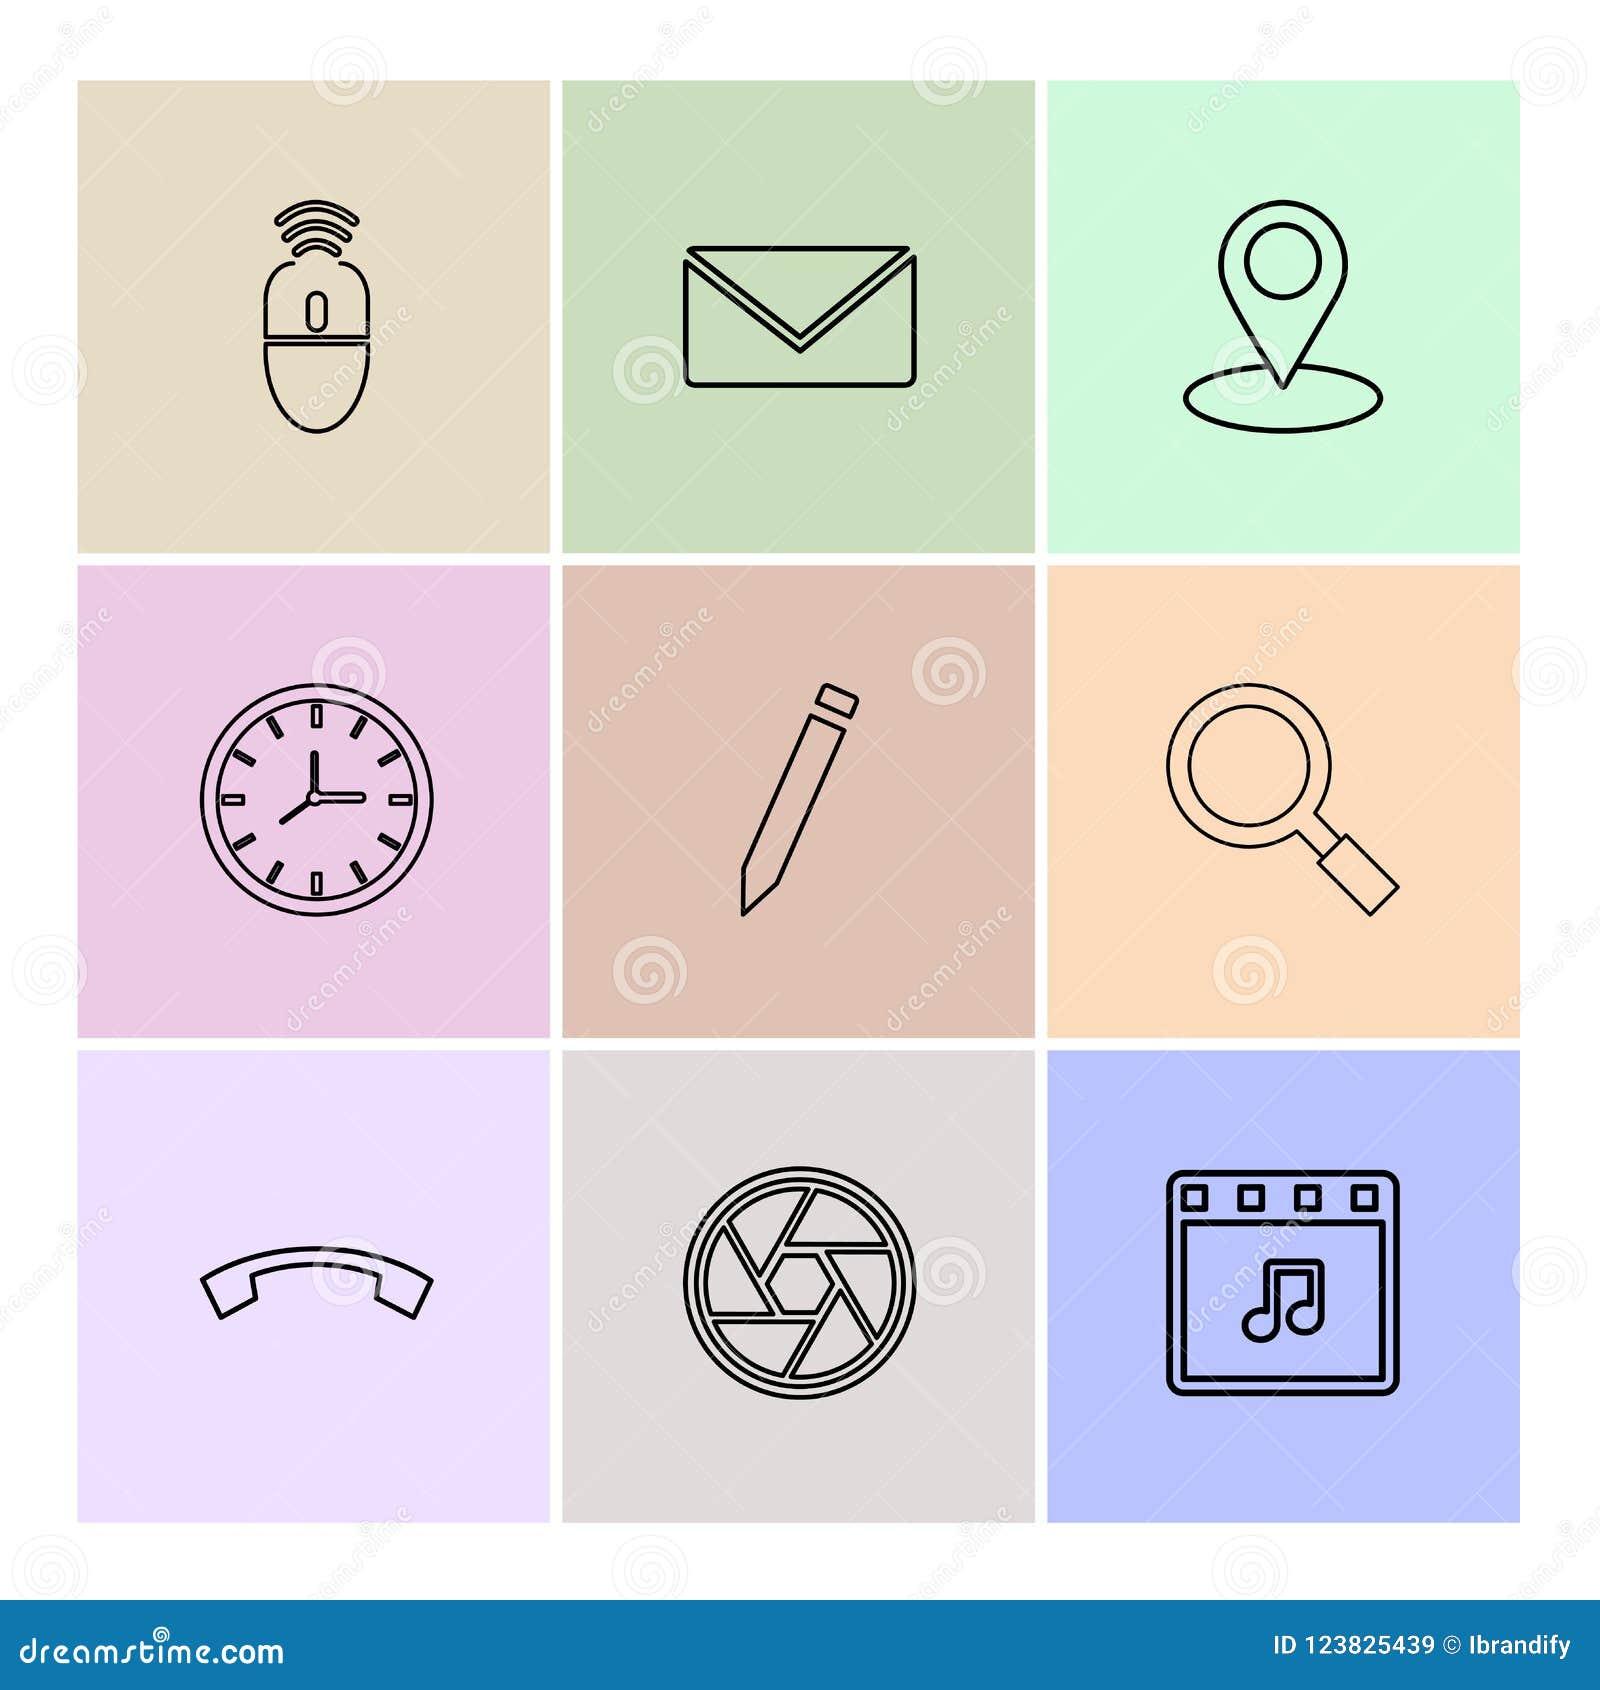 mouse, message ,navigation , search , music , clock , pencil , c